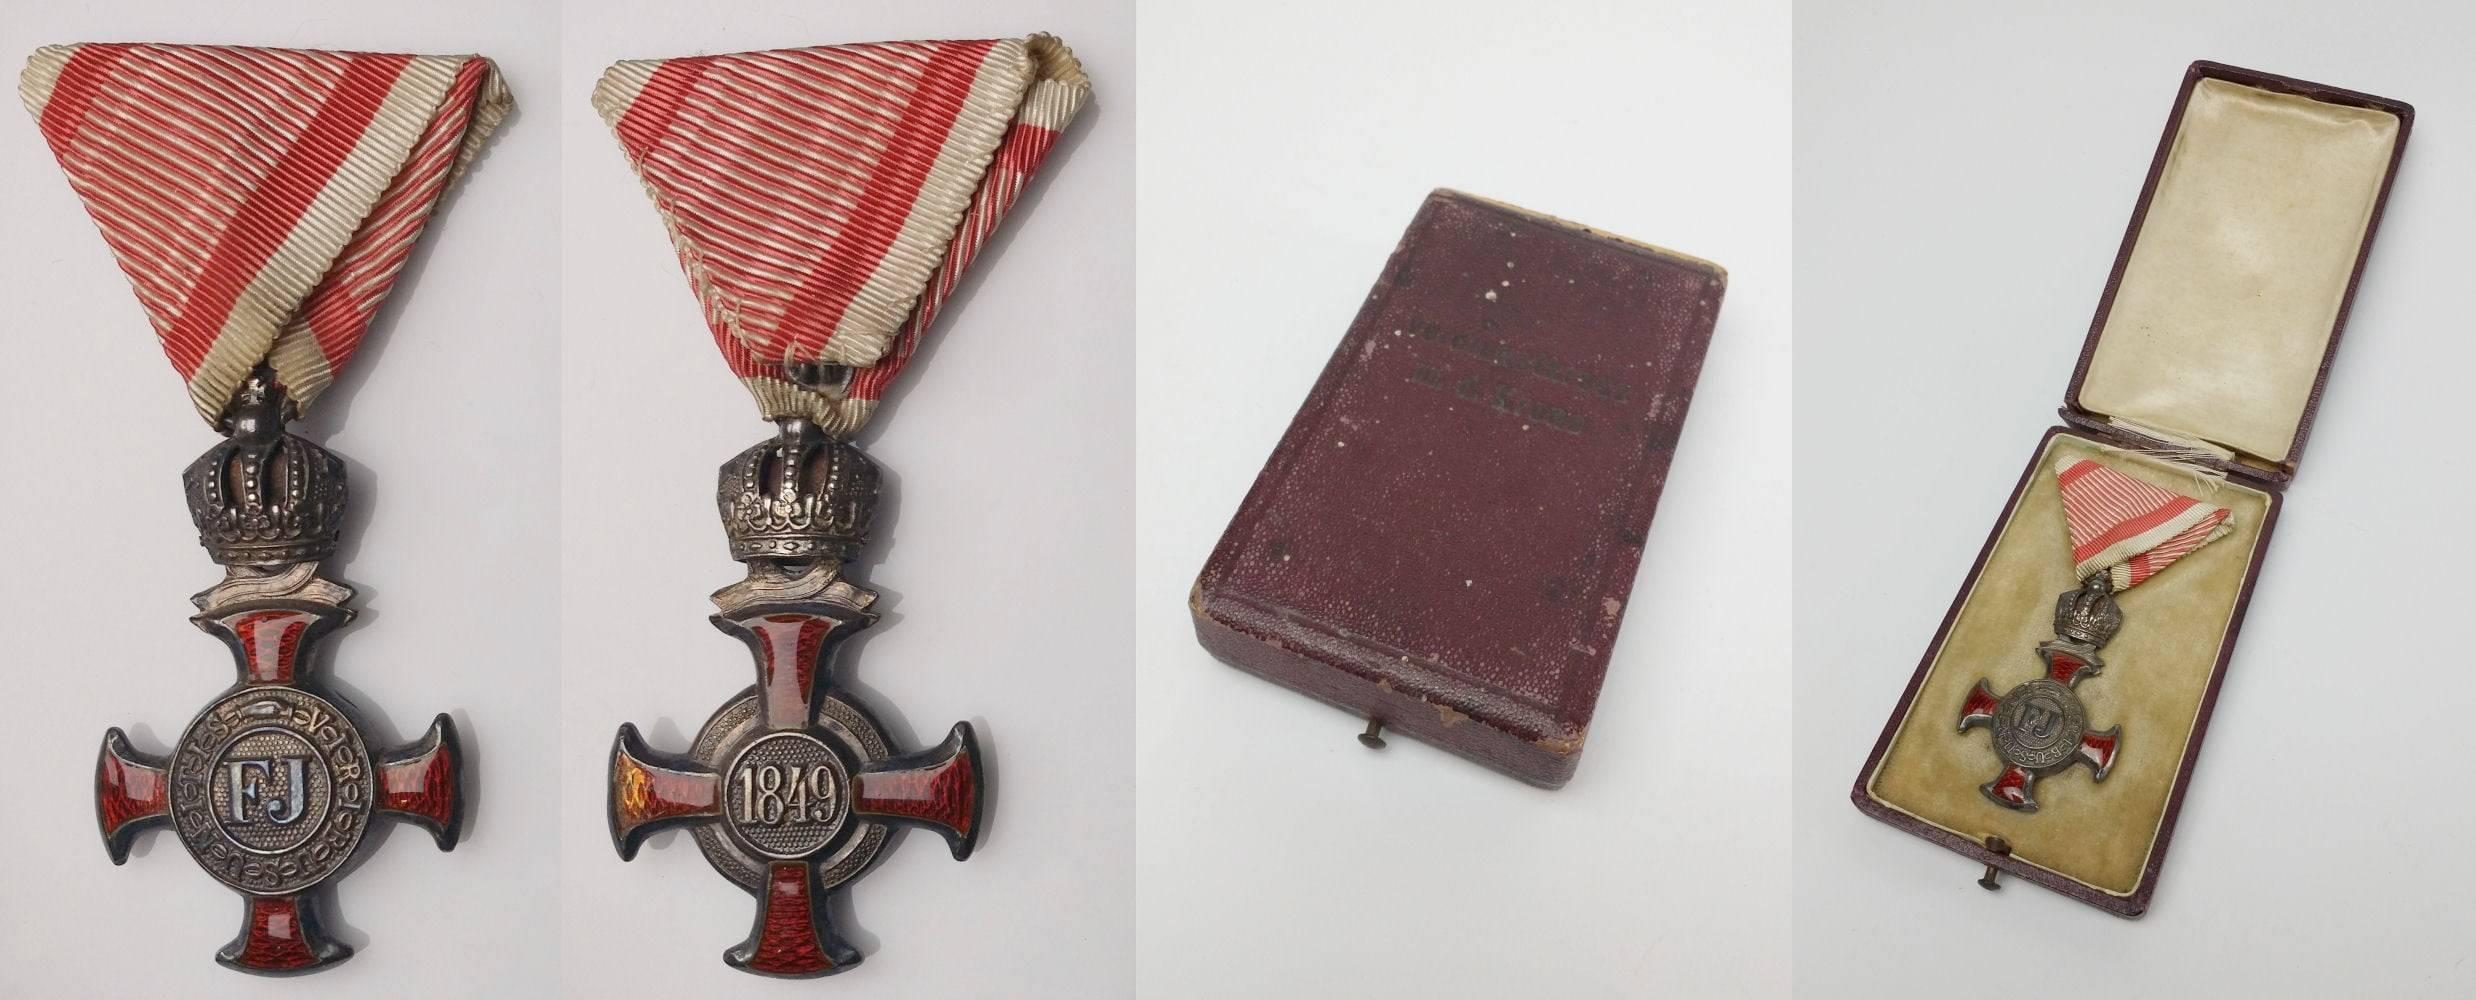 Otkup odlikovanja: Austrijsko odlikovanje Križ za zasluge (Verdienstkreuz)